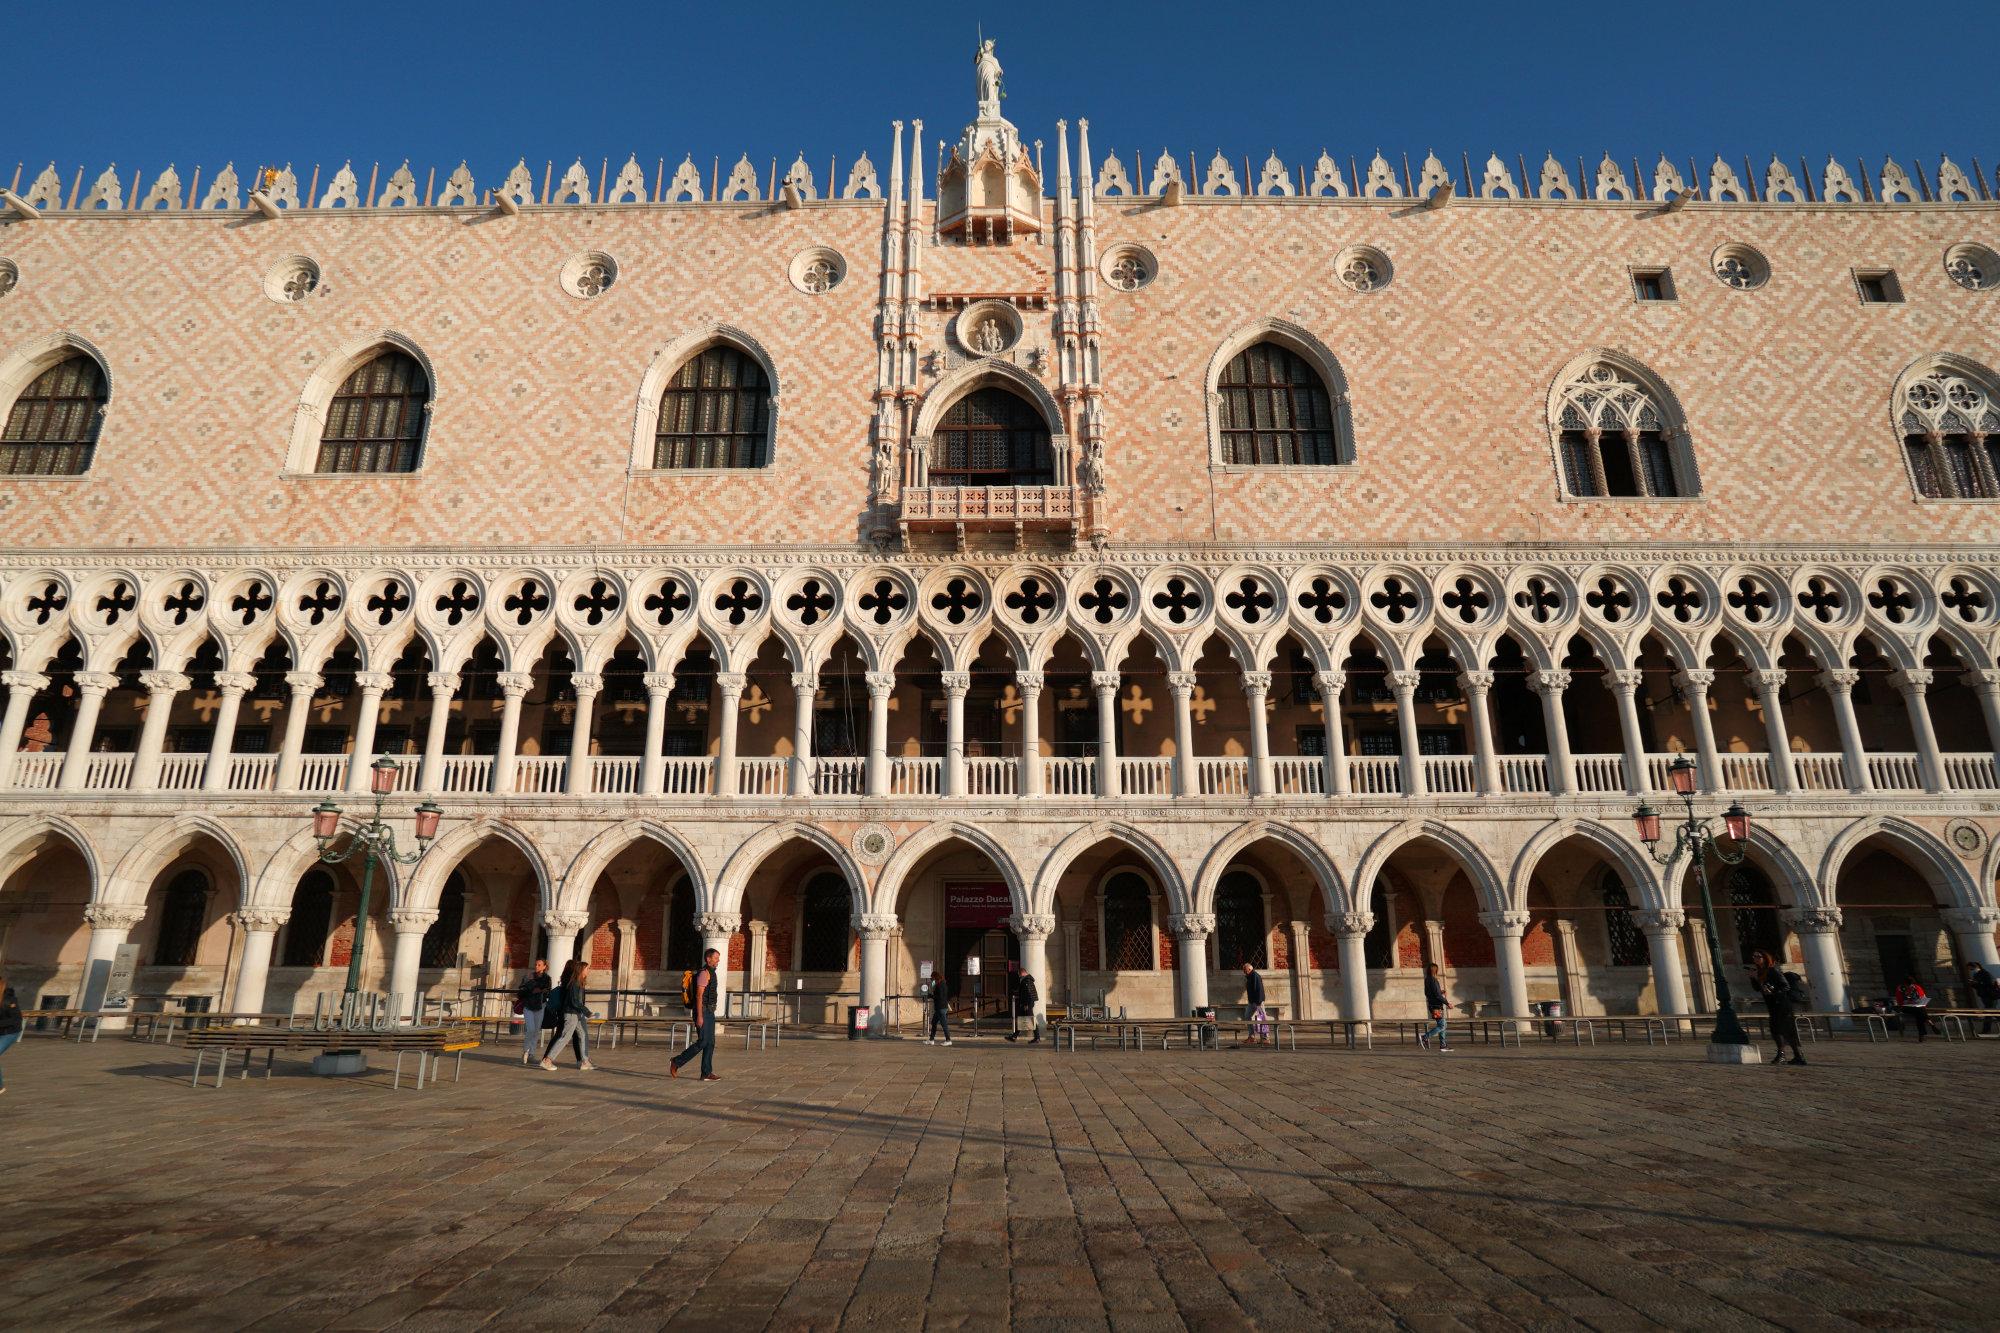 Venedig Dogenpalast frontal